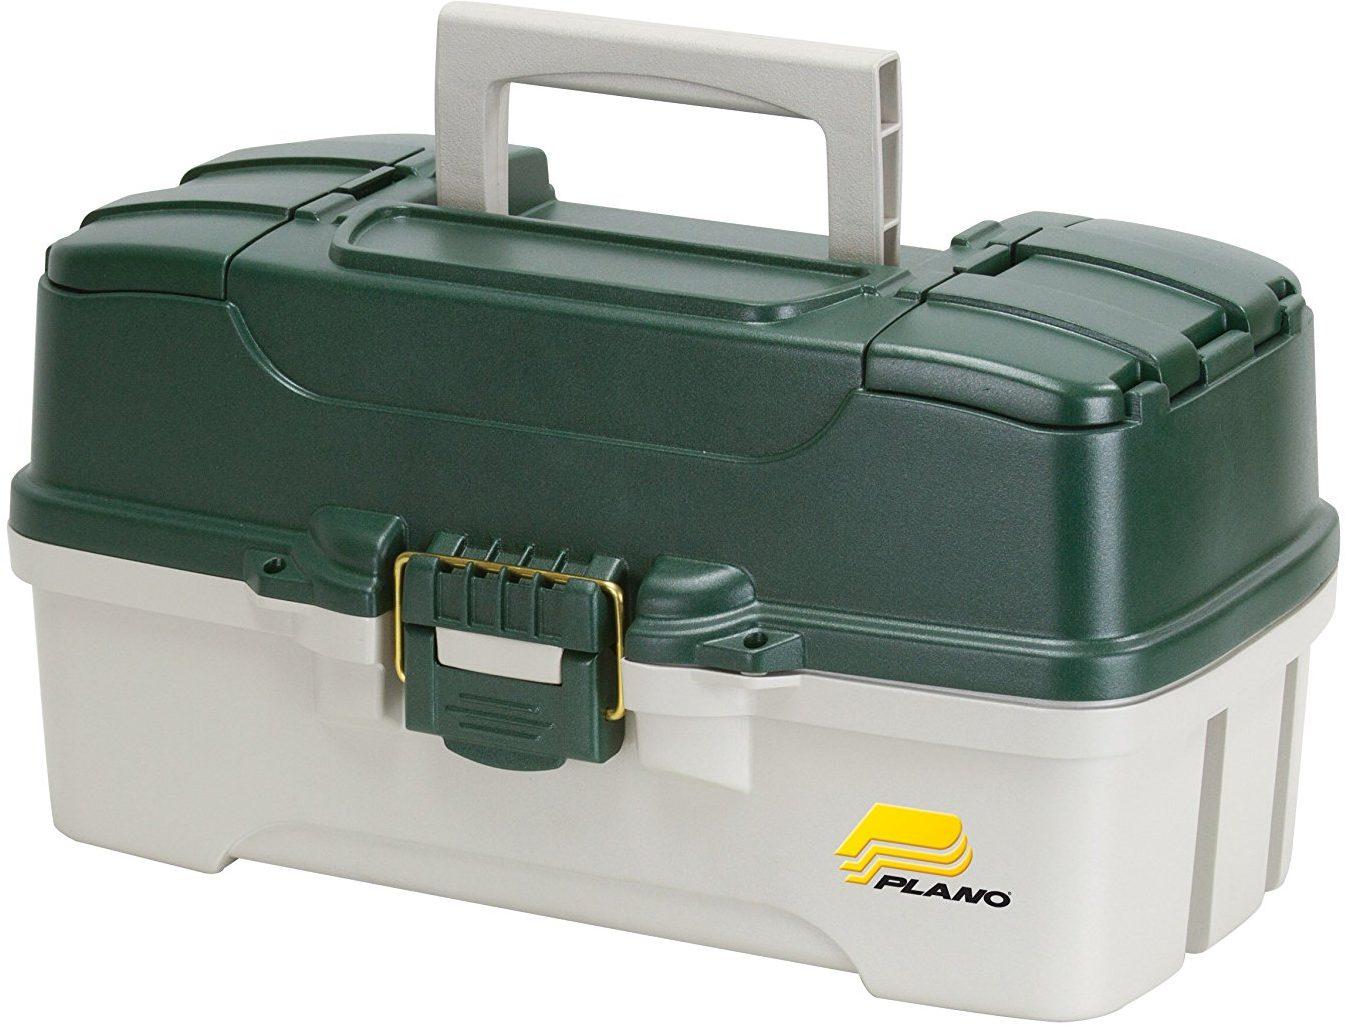 hight resolution of plano 3 tray tackle box